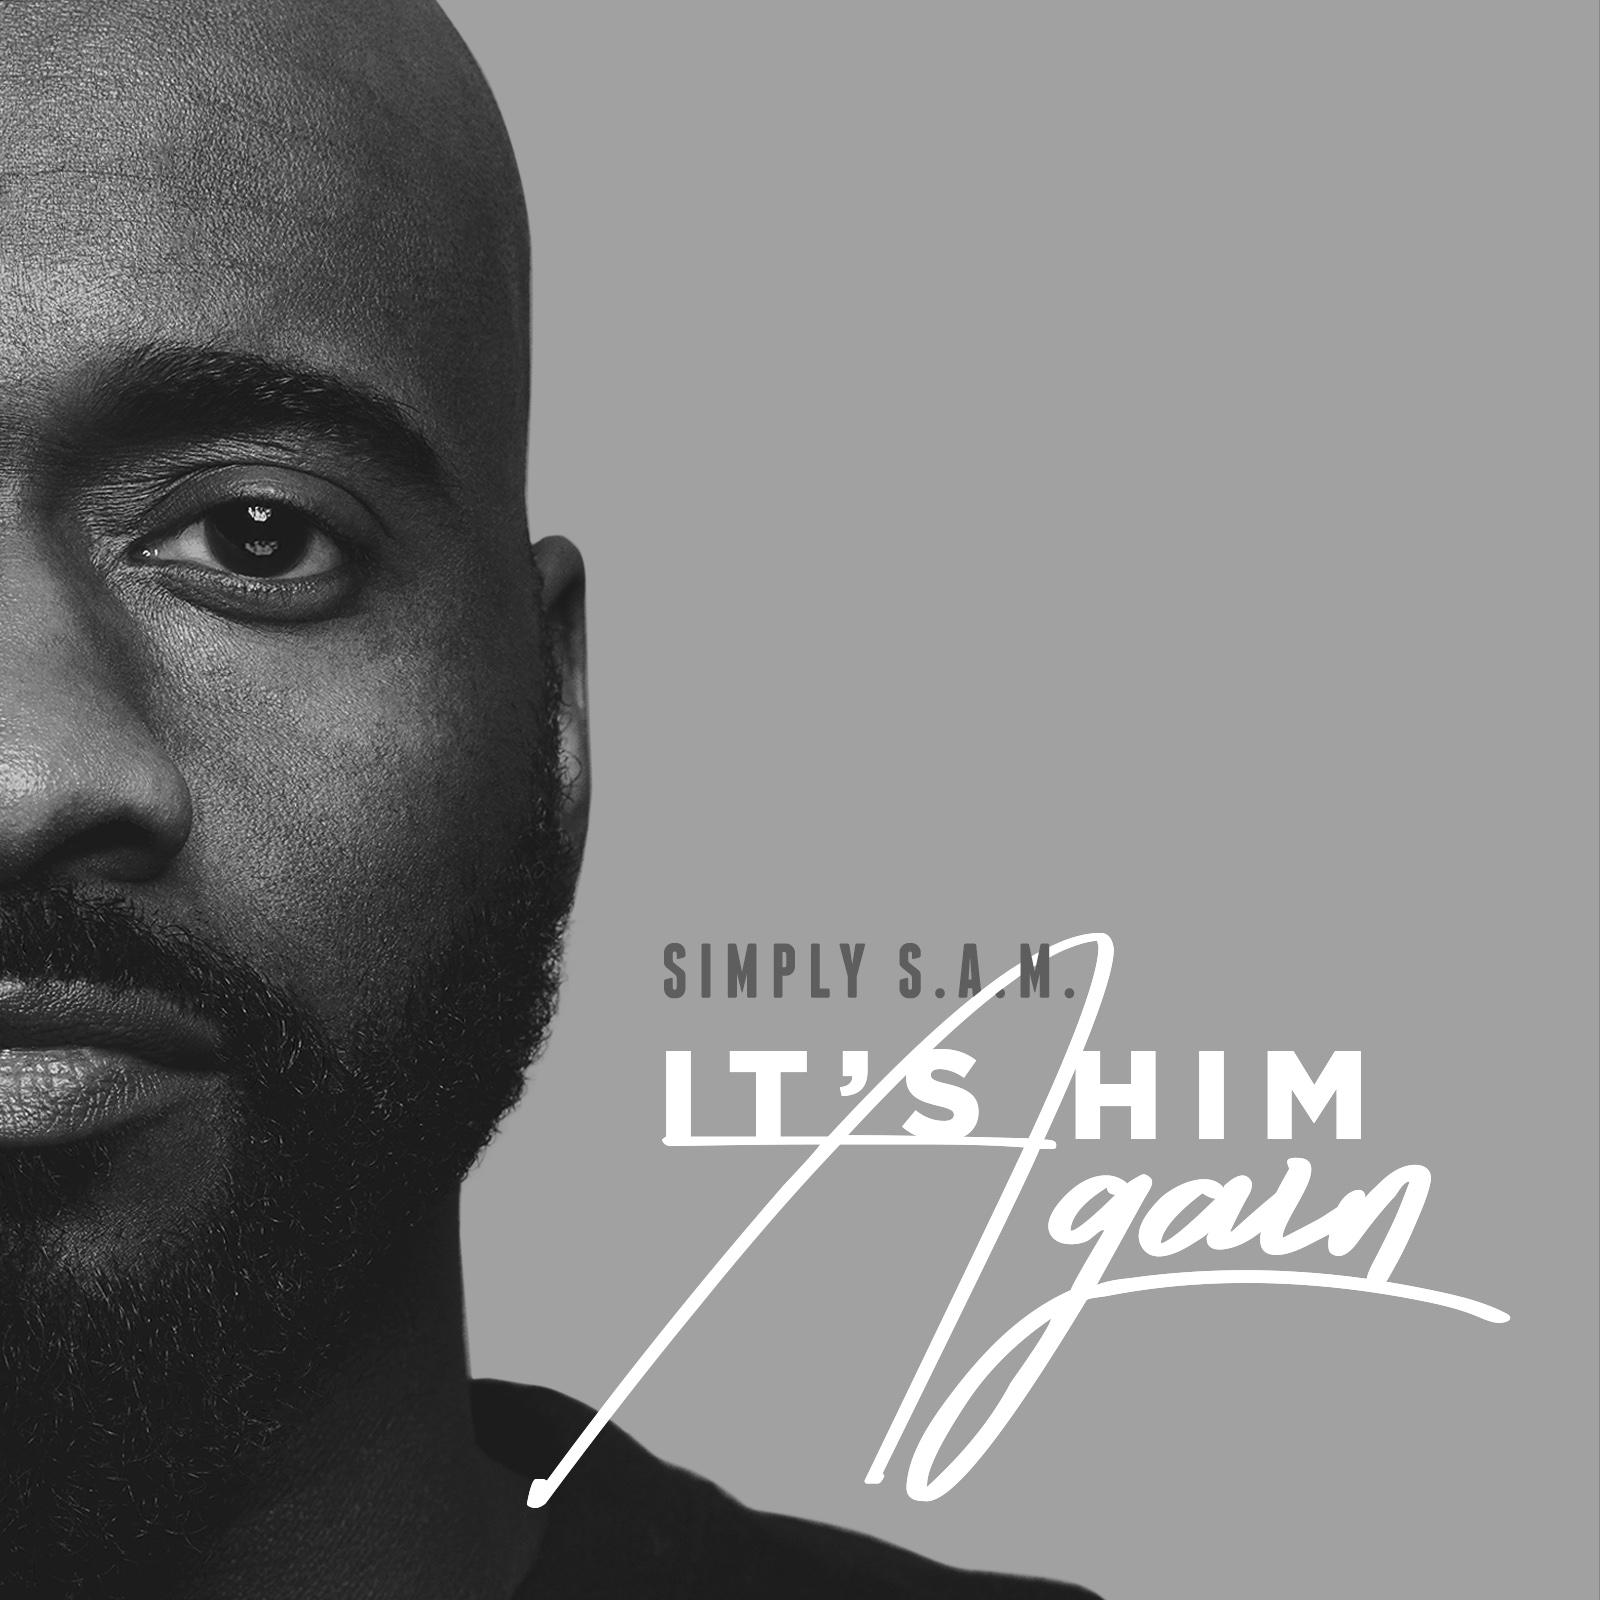 Simply S.A.M. - It's Him Again (EP)